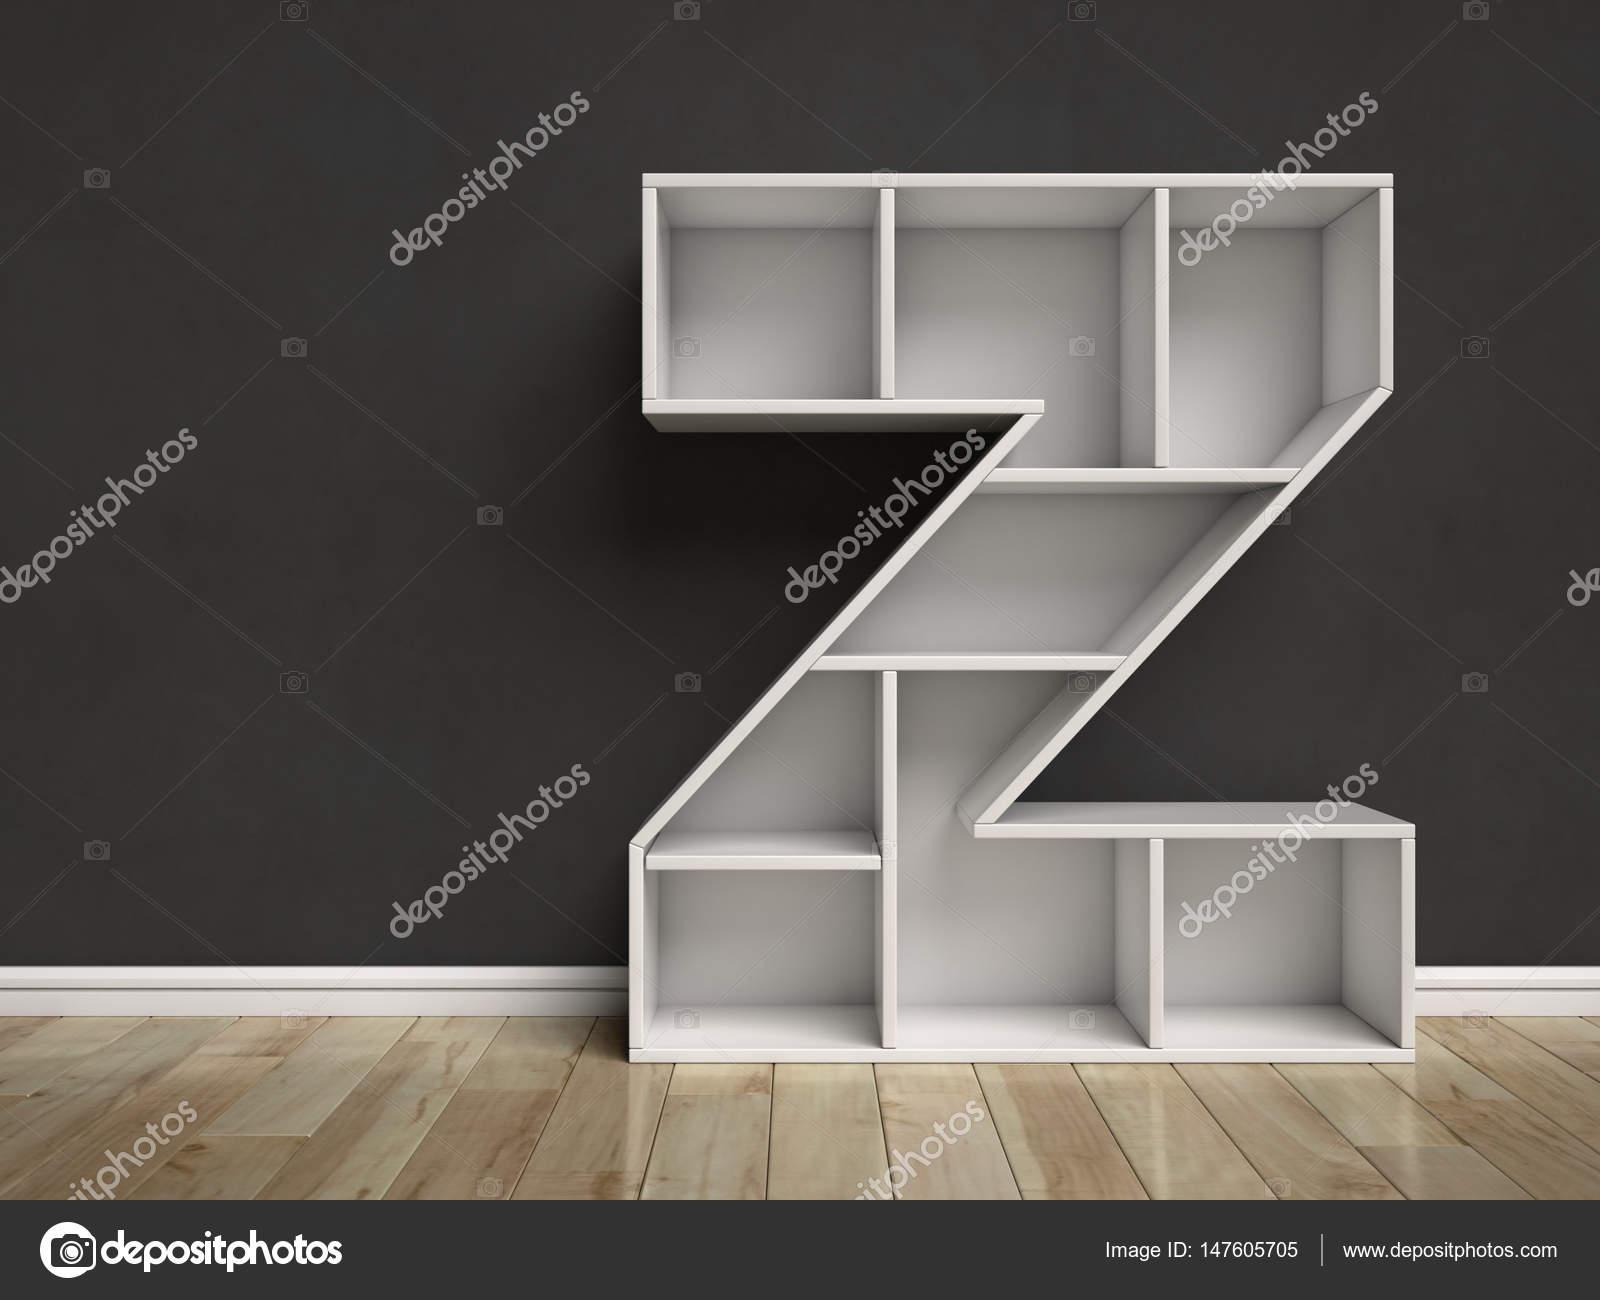 Letter Z Shaped Shelves U2014 Stock Photo